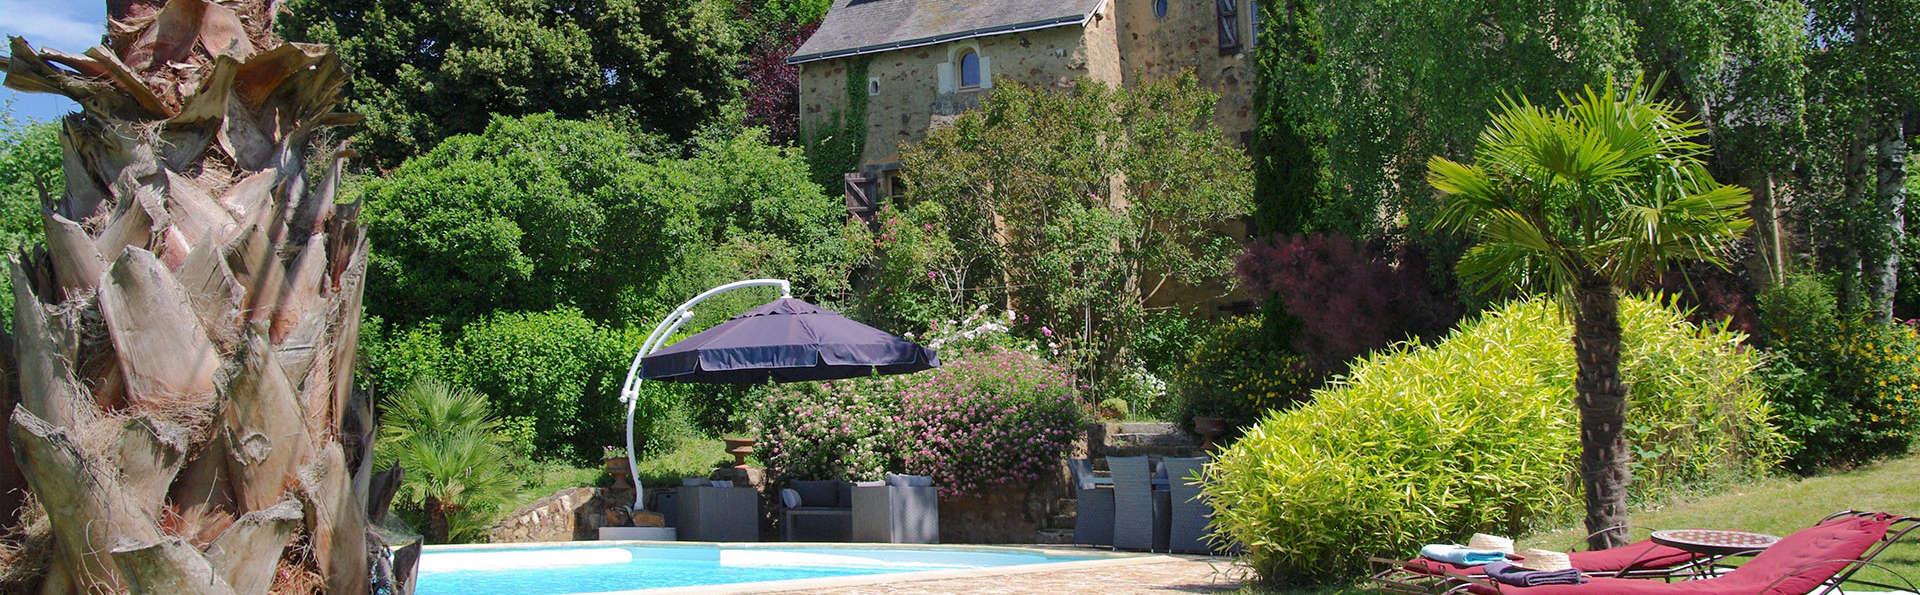 Manoir des Forges - Saint Brice - edit_pool3.jpg